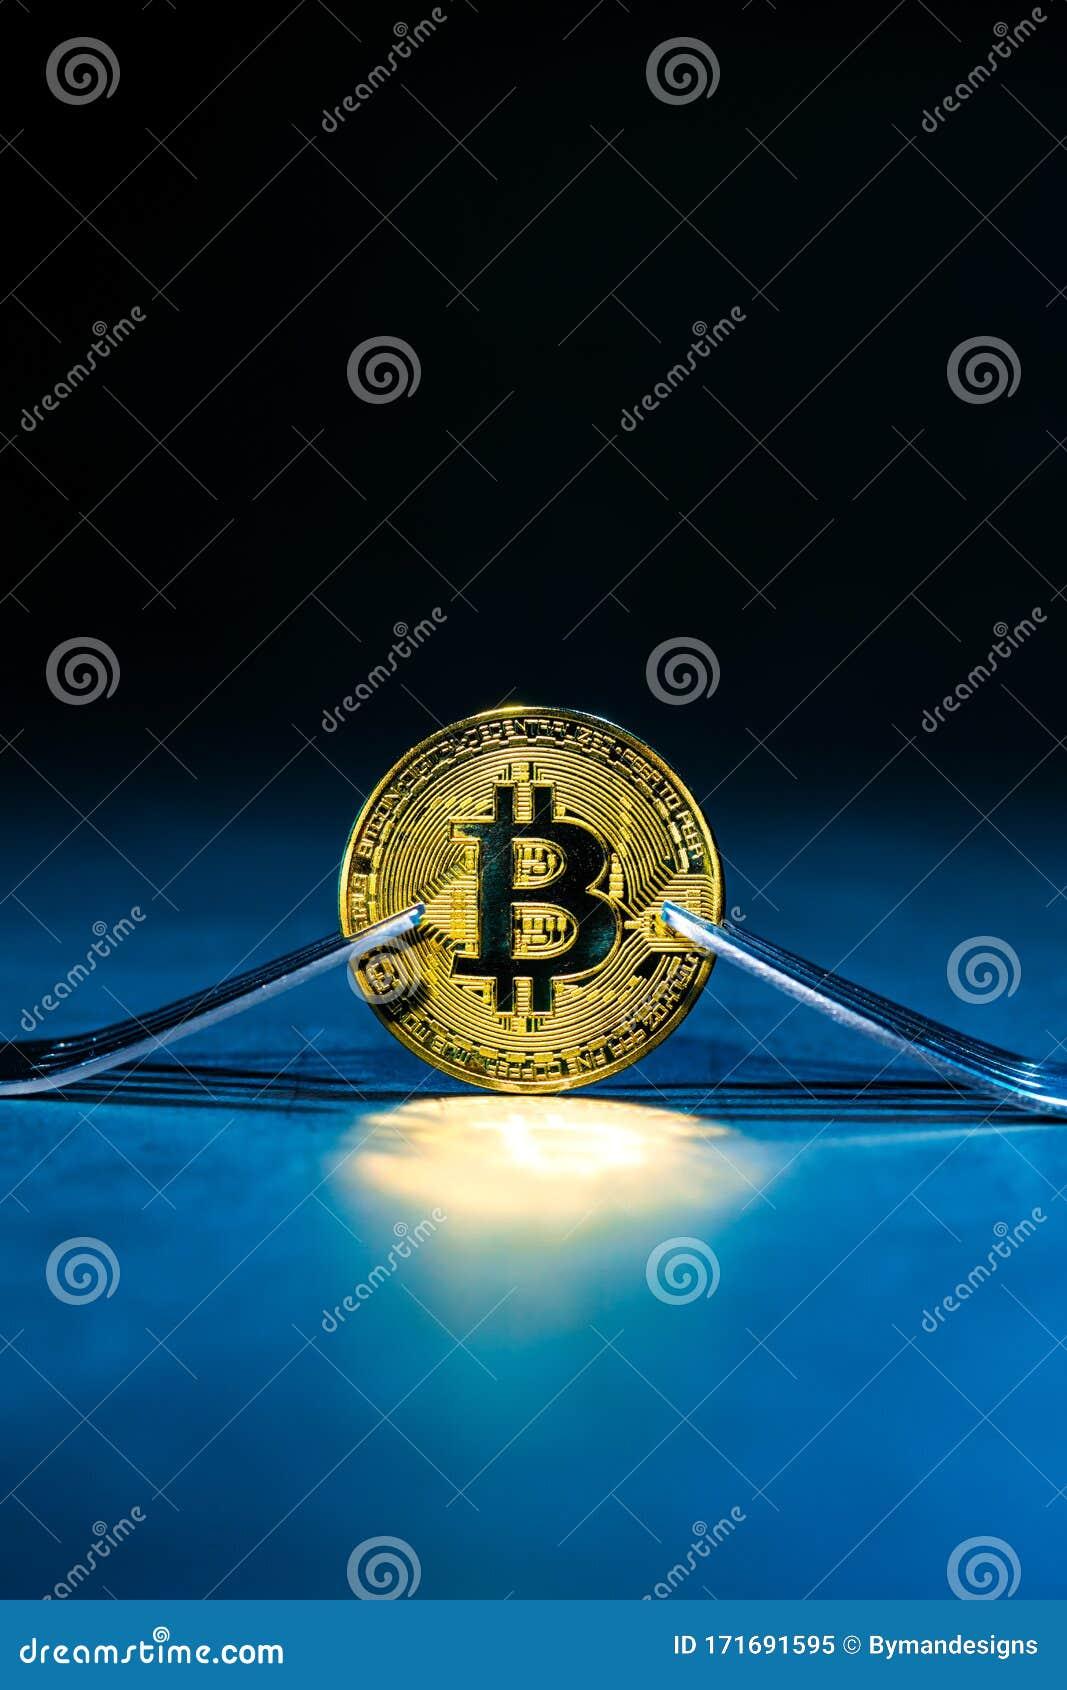 el ron crypto cryptocurrency coin